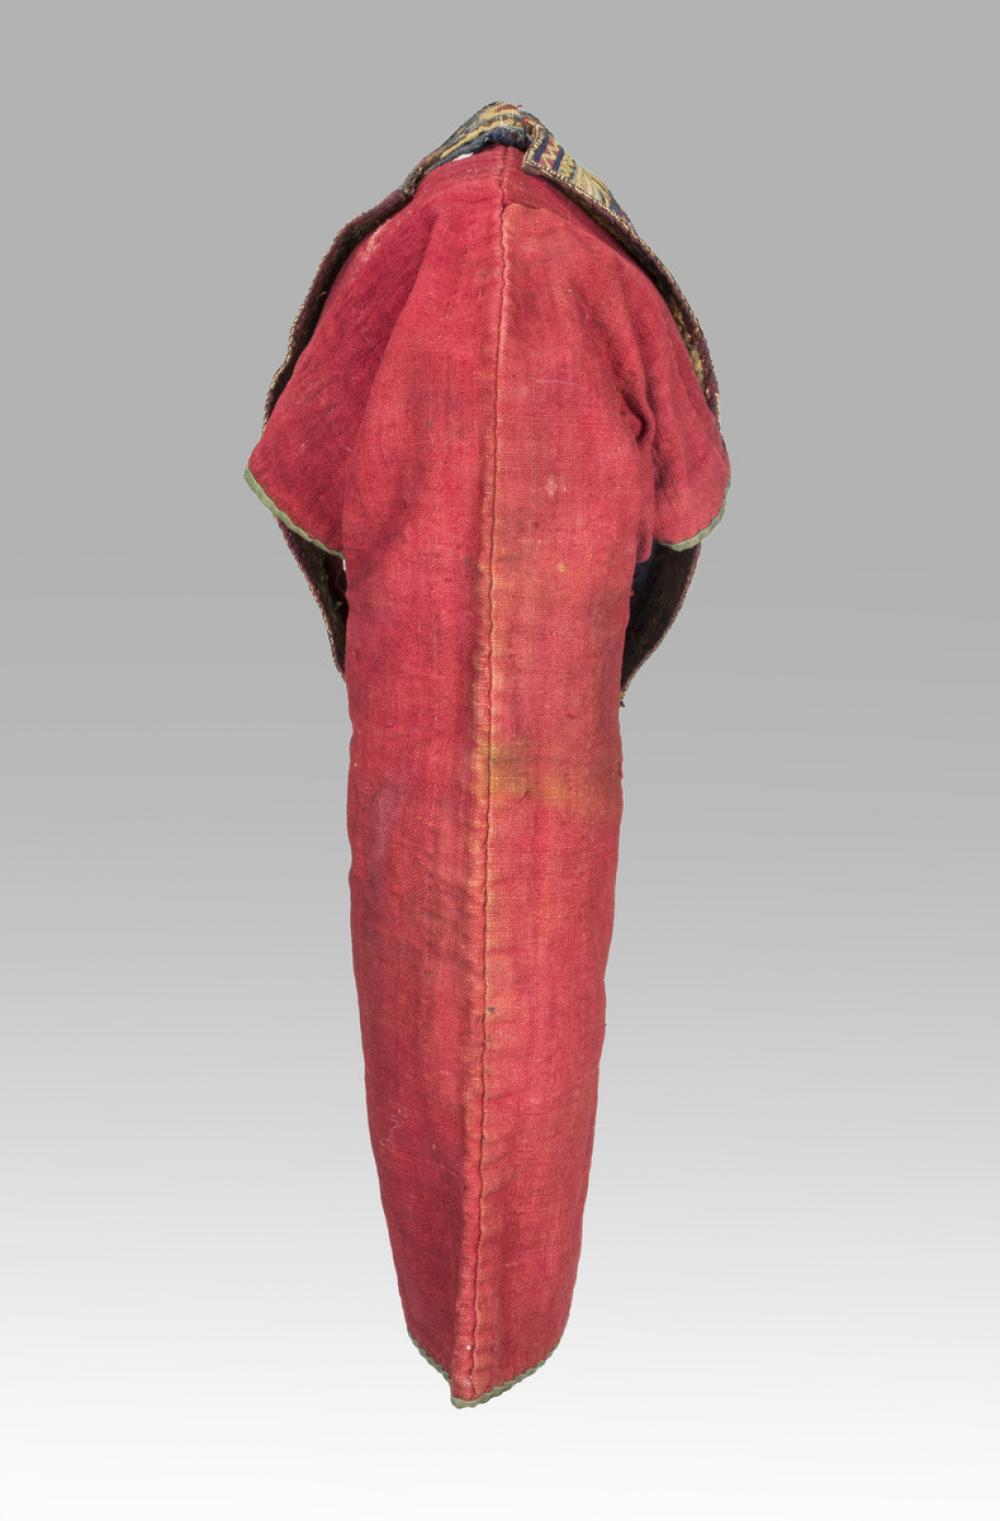 Persian, Woman's headdress